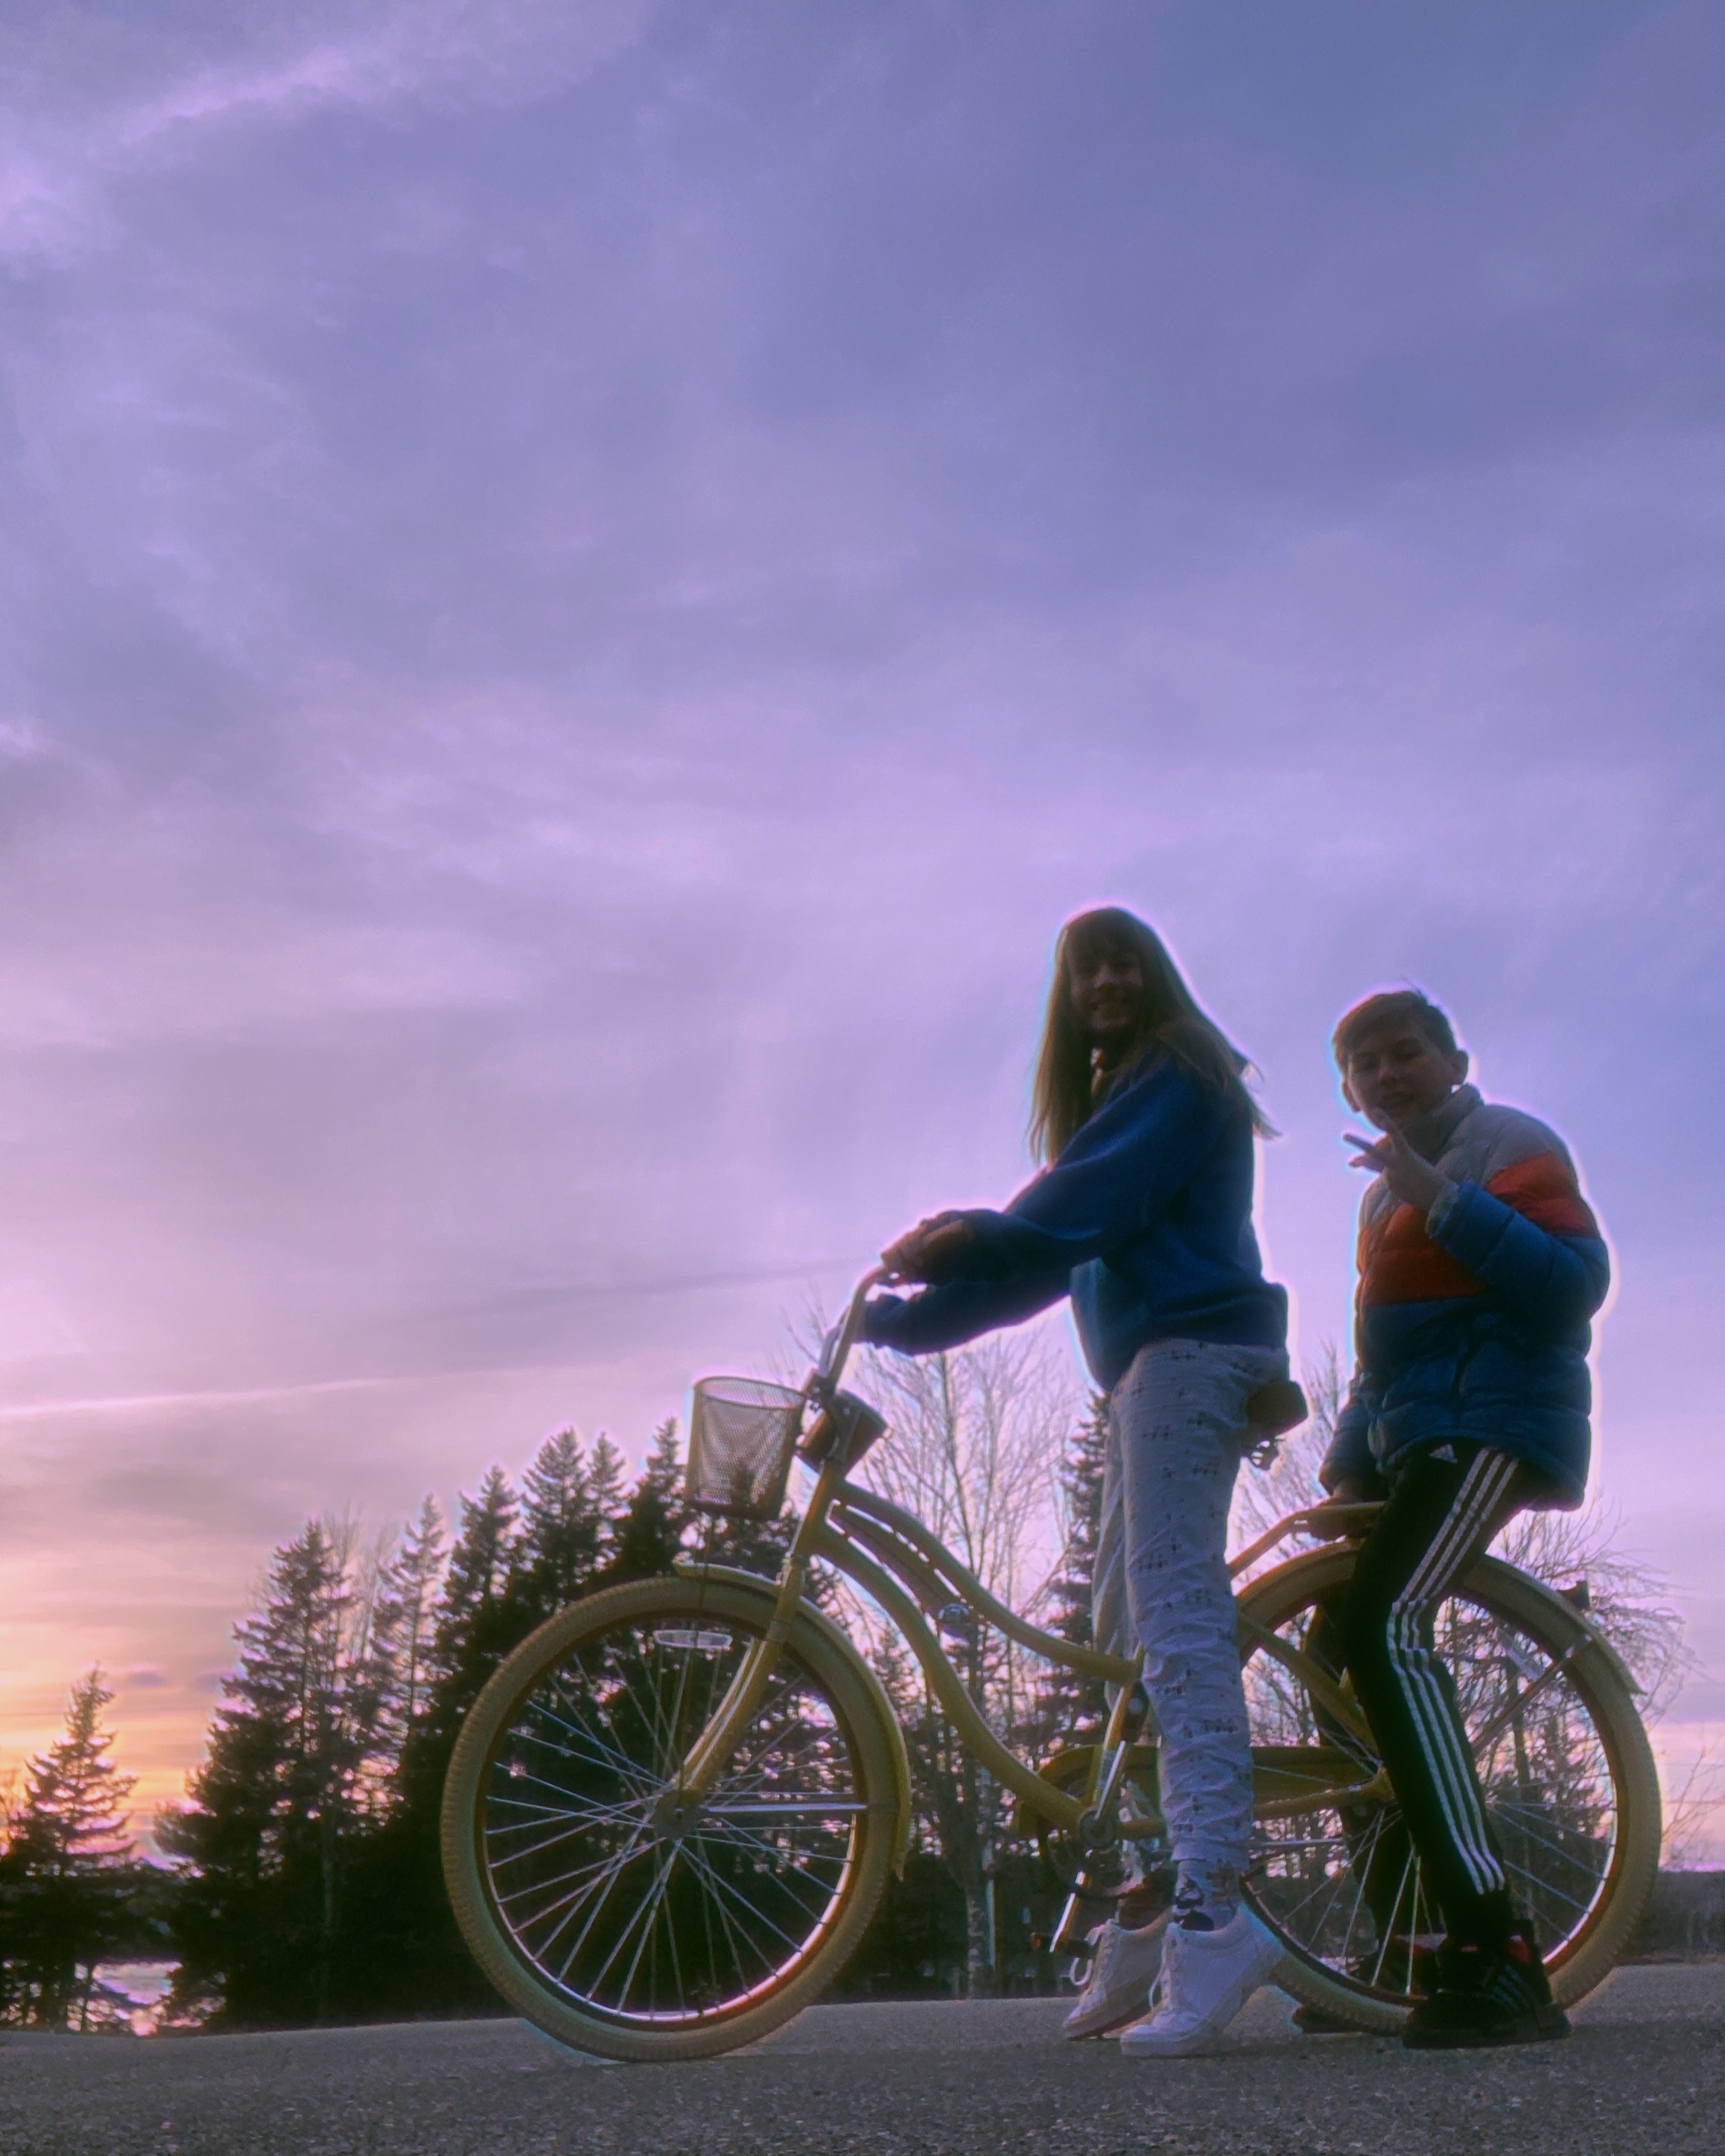 Playing on a bike